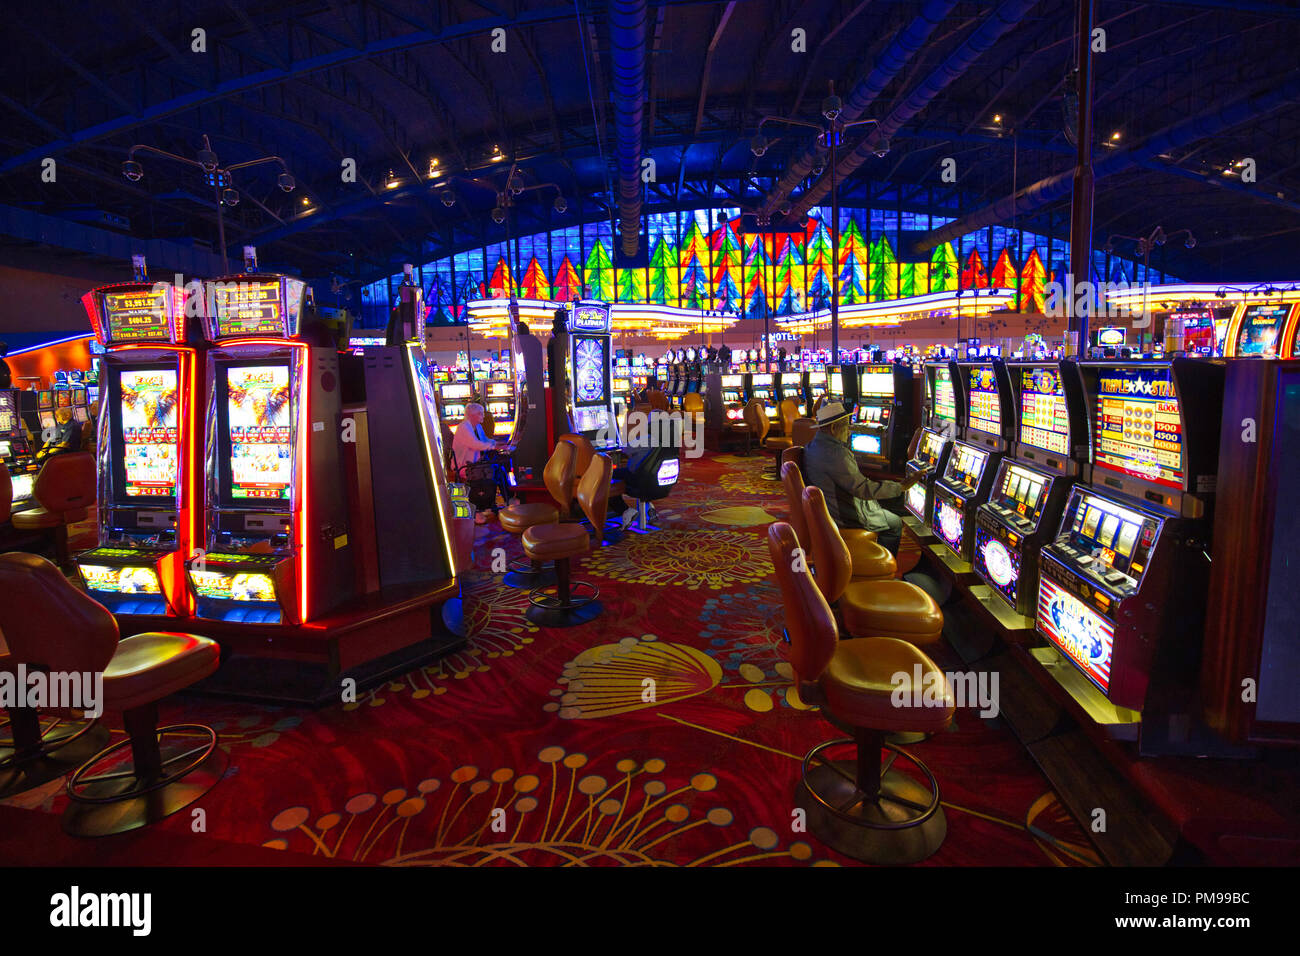 She d spent 0 playing slot machines at Seneca Niagara that night